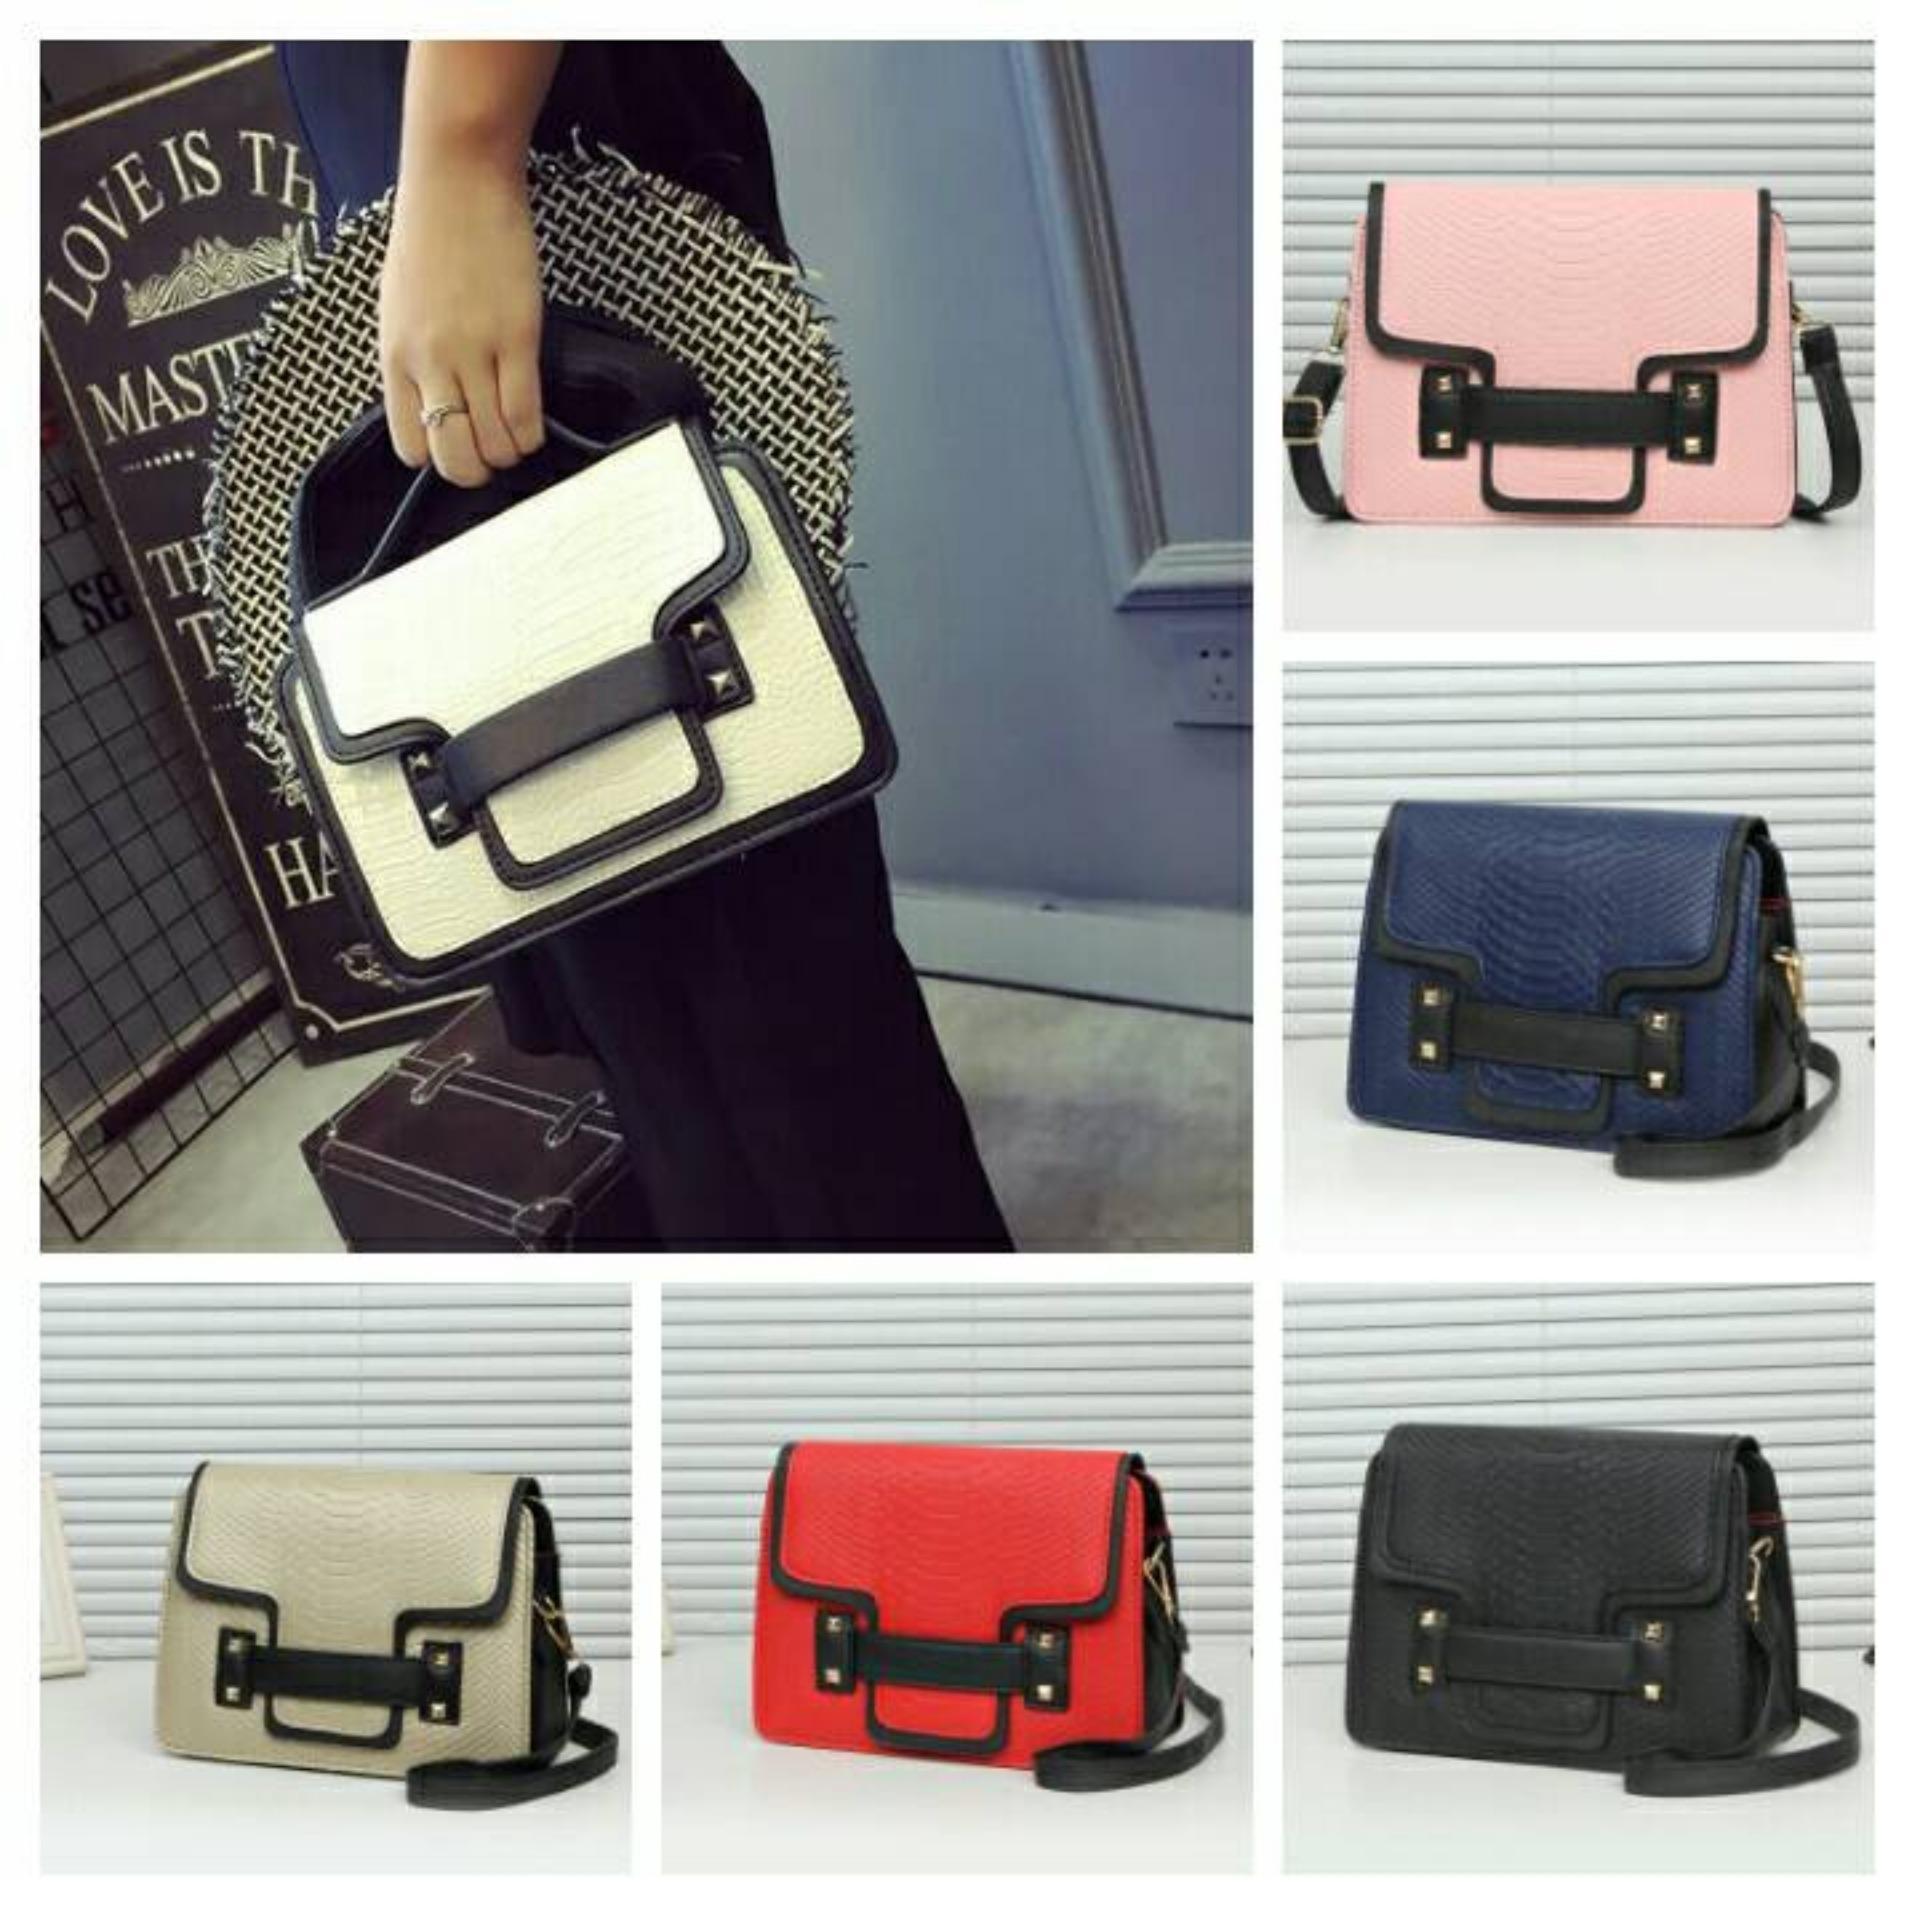 Urbantrendy - Korean Style / Best Seller Fashion bag Import / Handbag wanita C12075